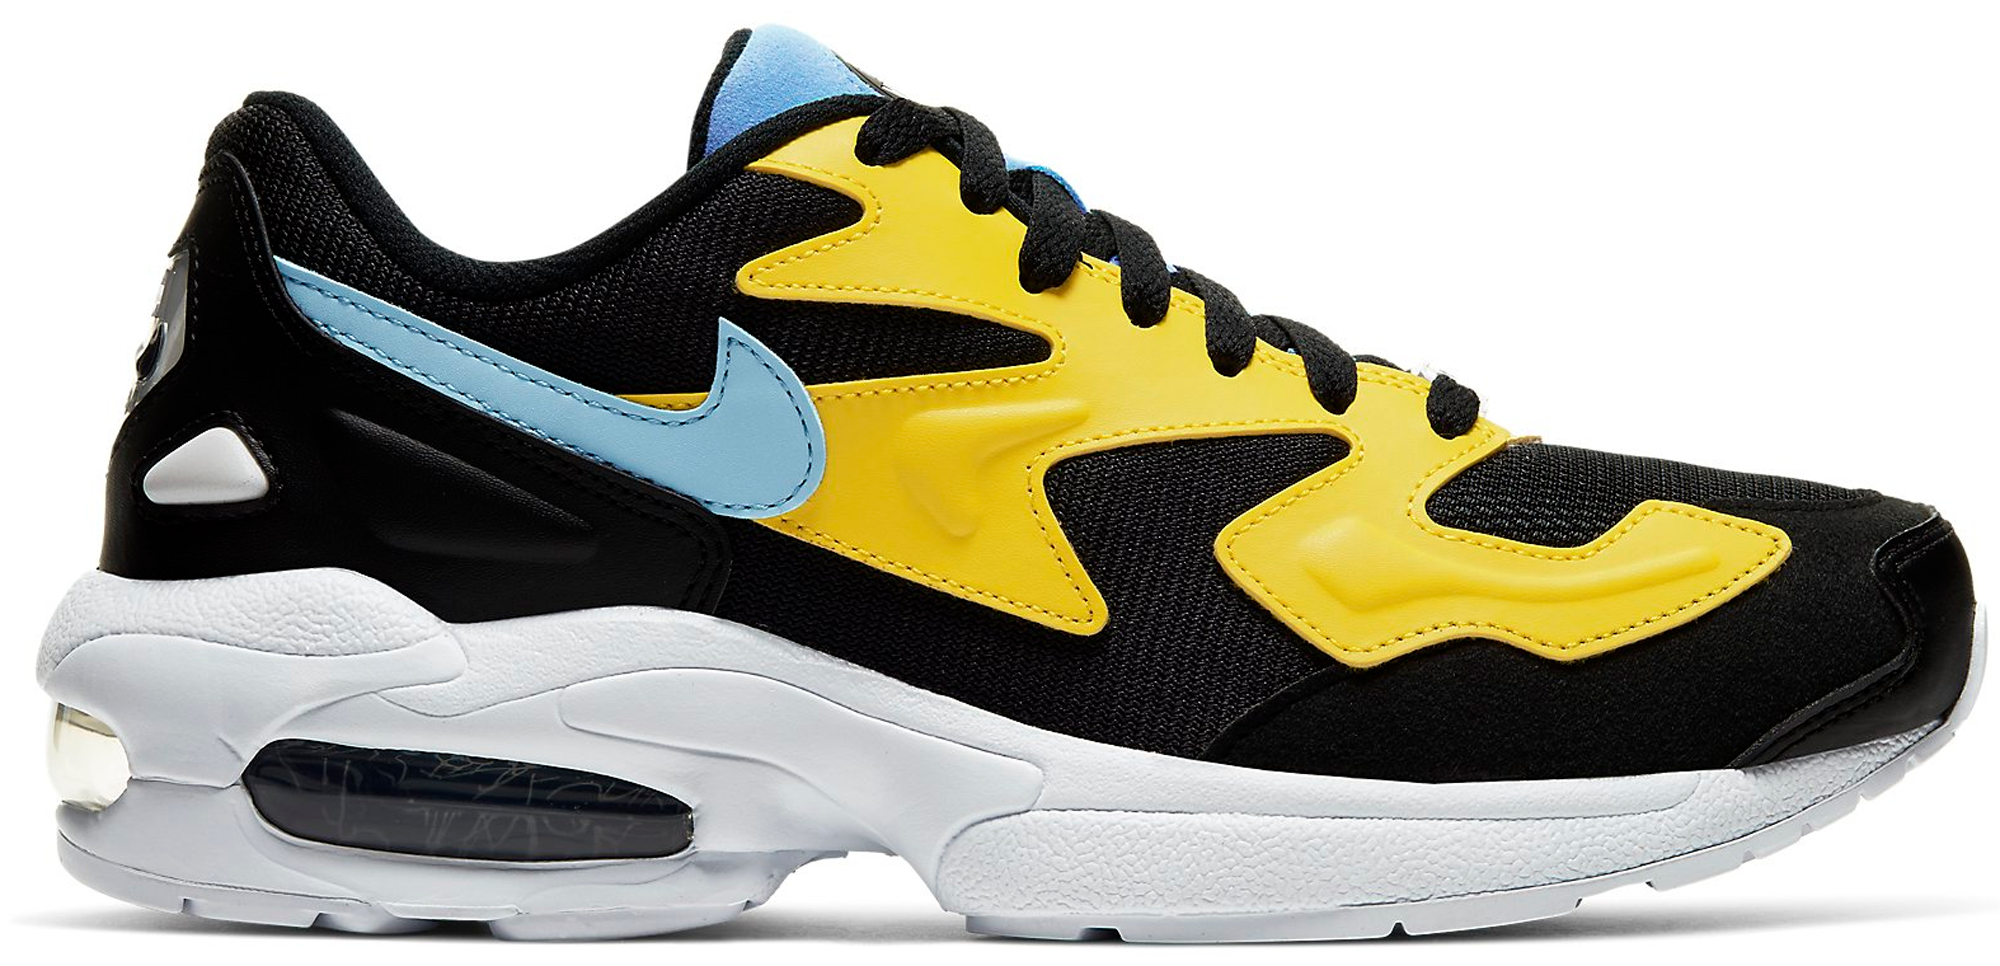 Nike Air Max 2 Light Yellow Light Blue